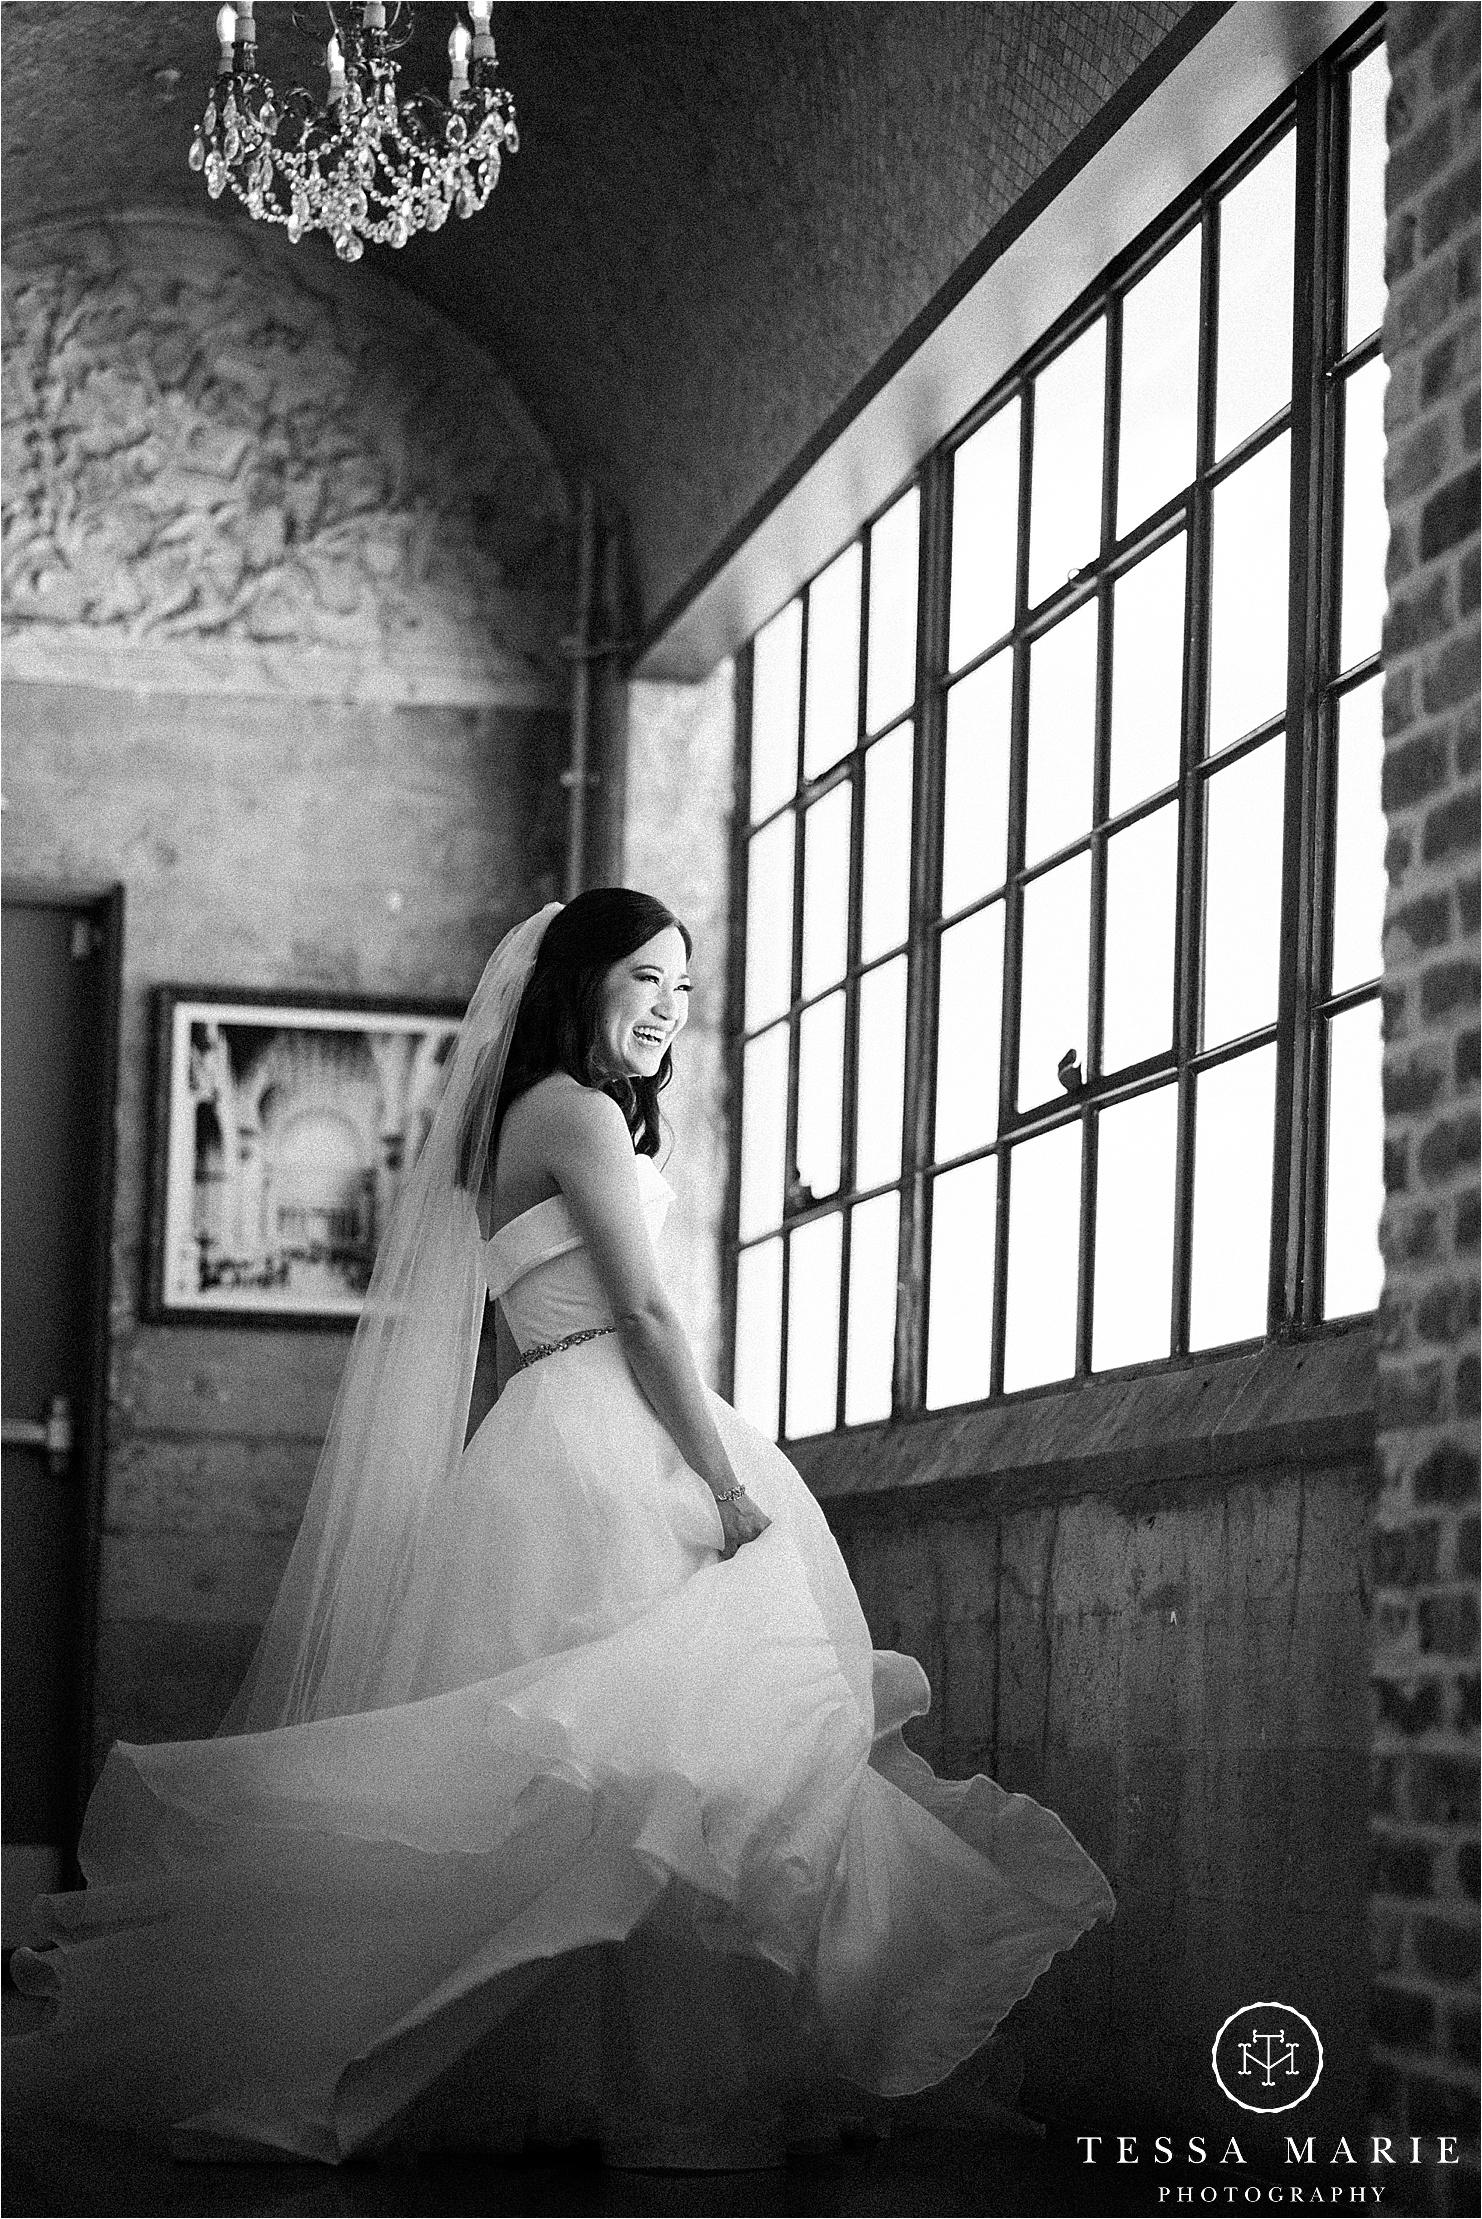 Tessa_marie_weddings_houston_wedding_photographer_The_astorian_0042.jpg